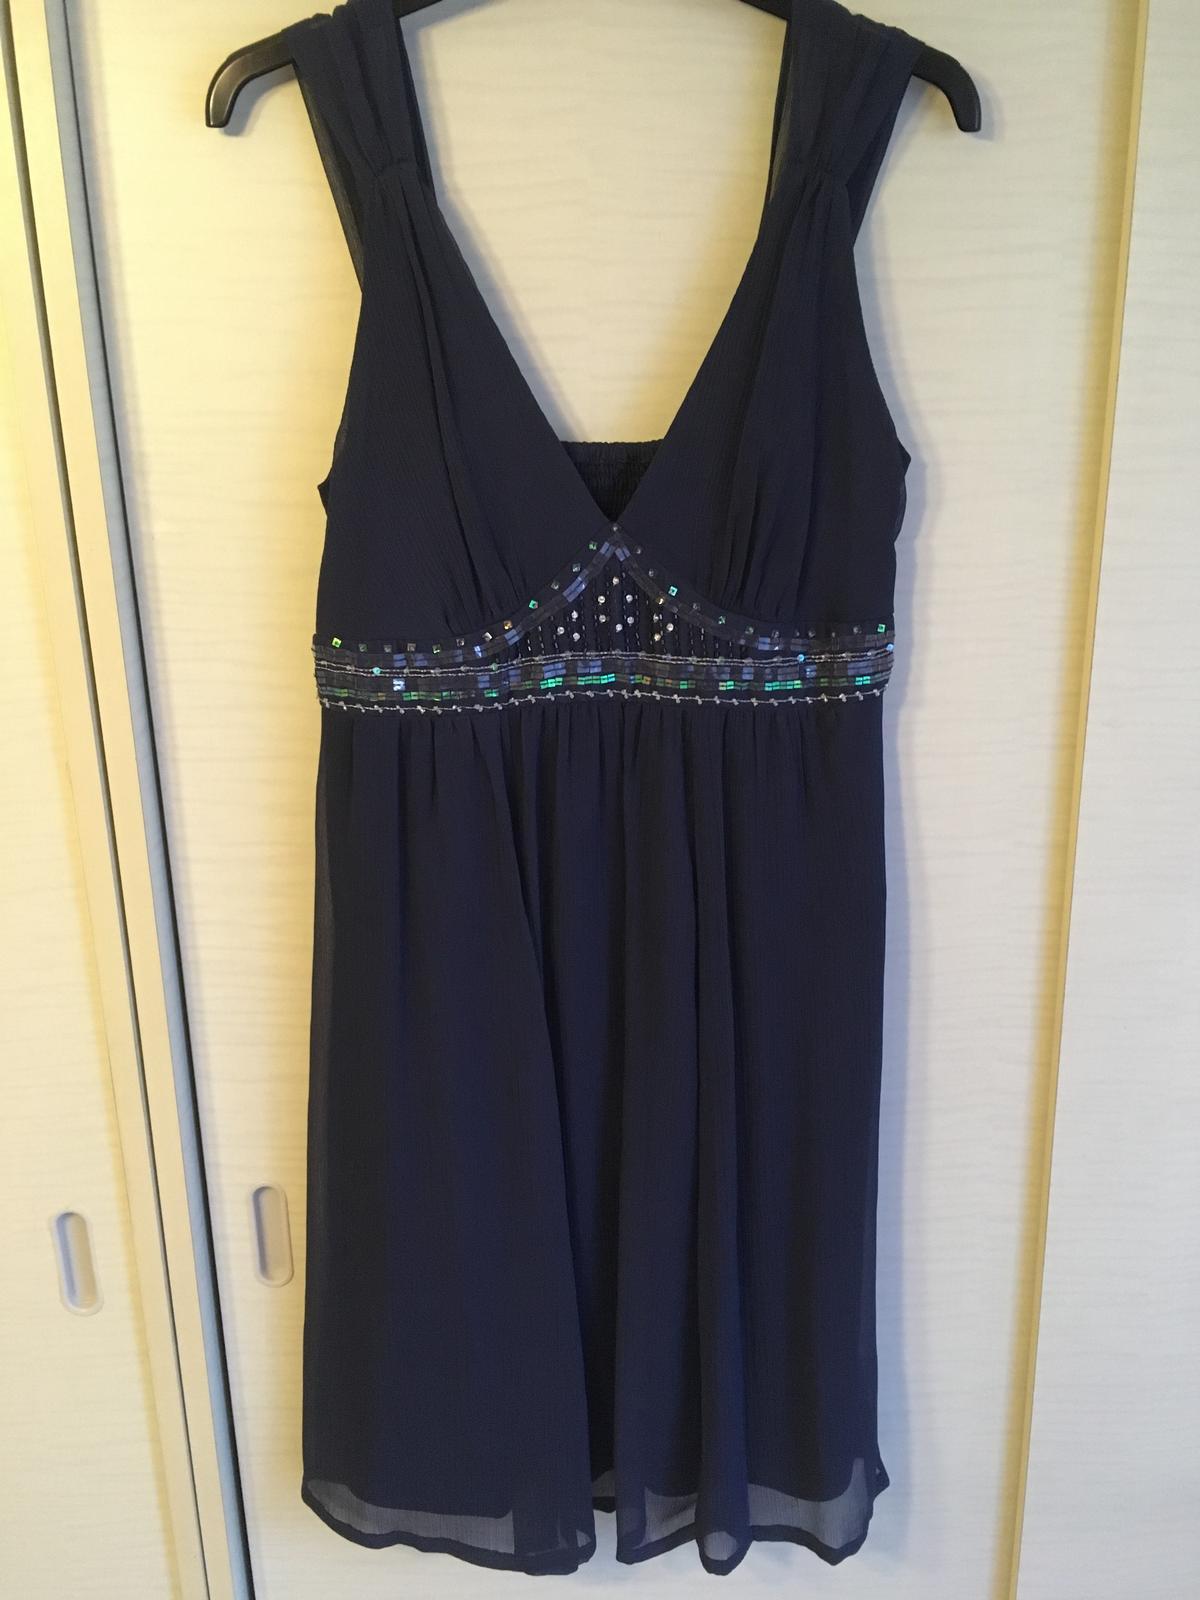 Tmavomodré šaty s korálikmi a flitrami - Obrázok č. 1